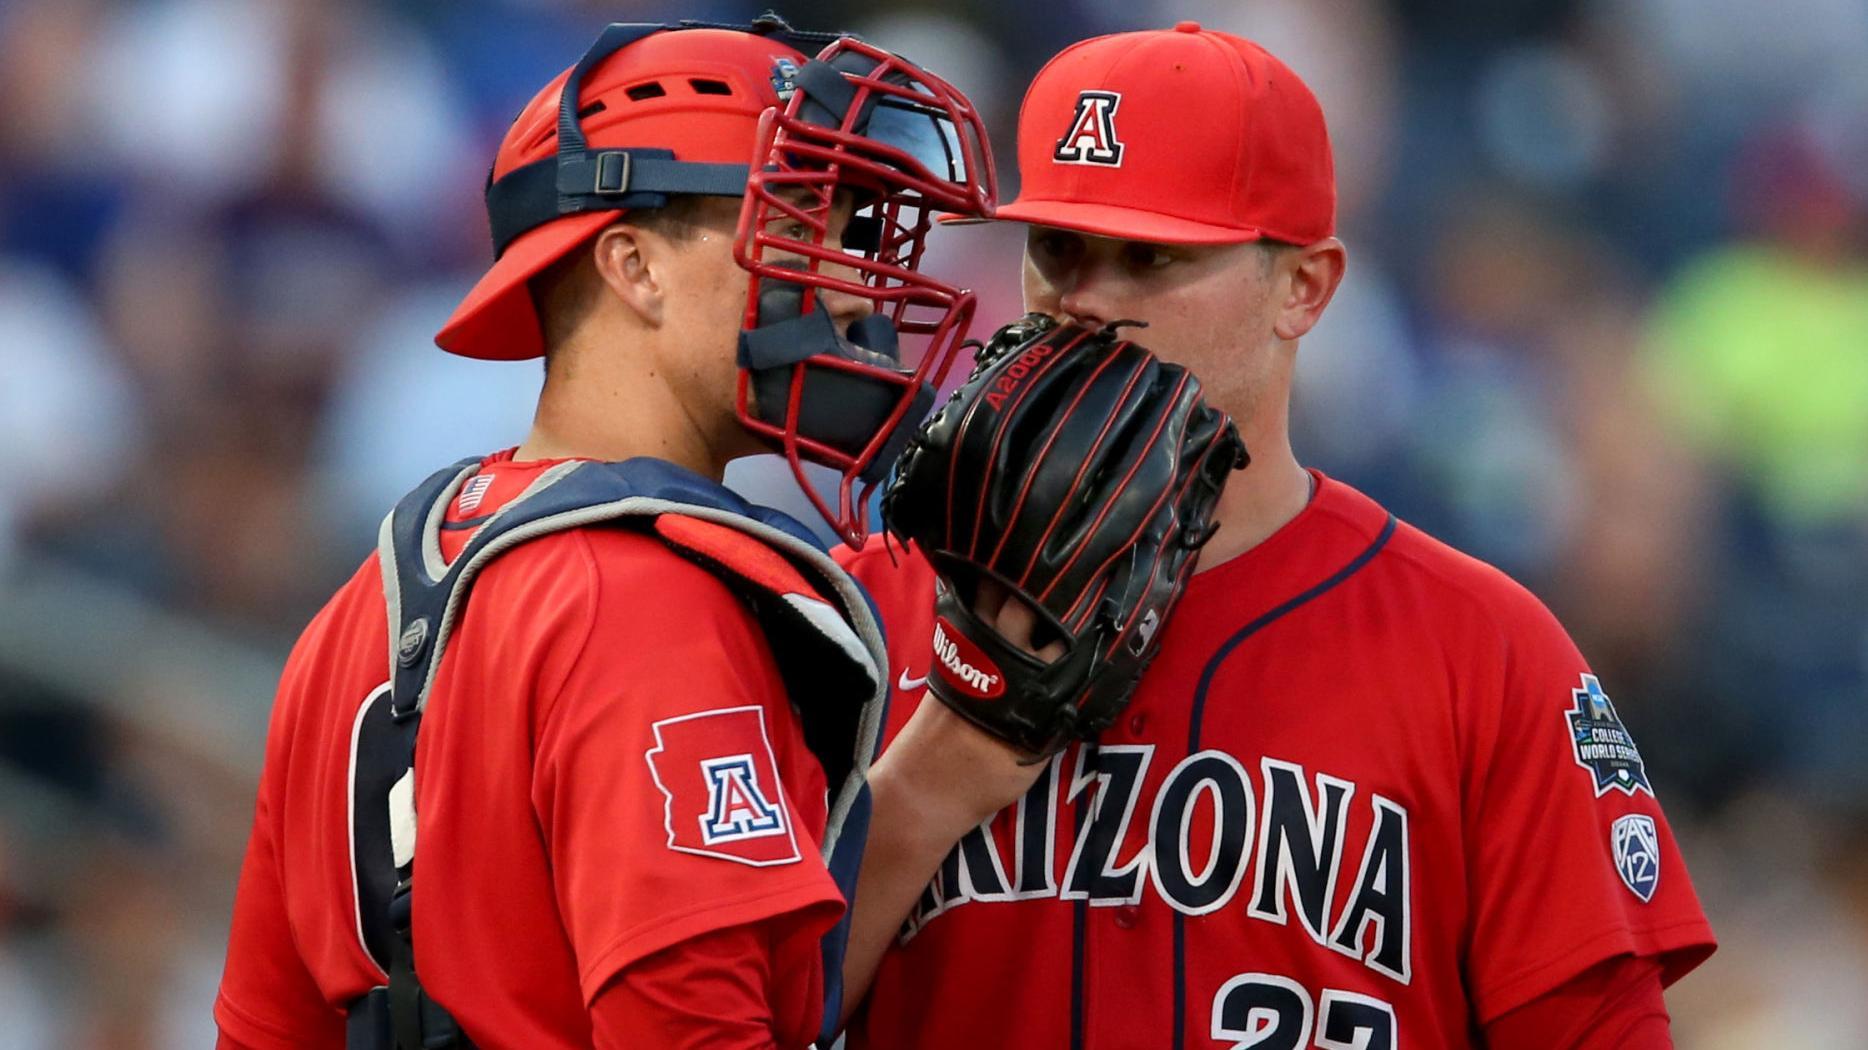 http://tucson.com/sports/arizonawildcats/baseball/jc-cloney-to-start-for-arizona-in-game-of-college/article_3323a4c8-3cae-11e6-b0dc-2f55f4c94600.html